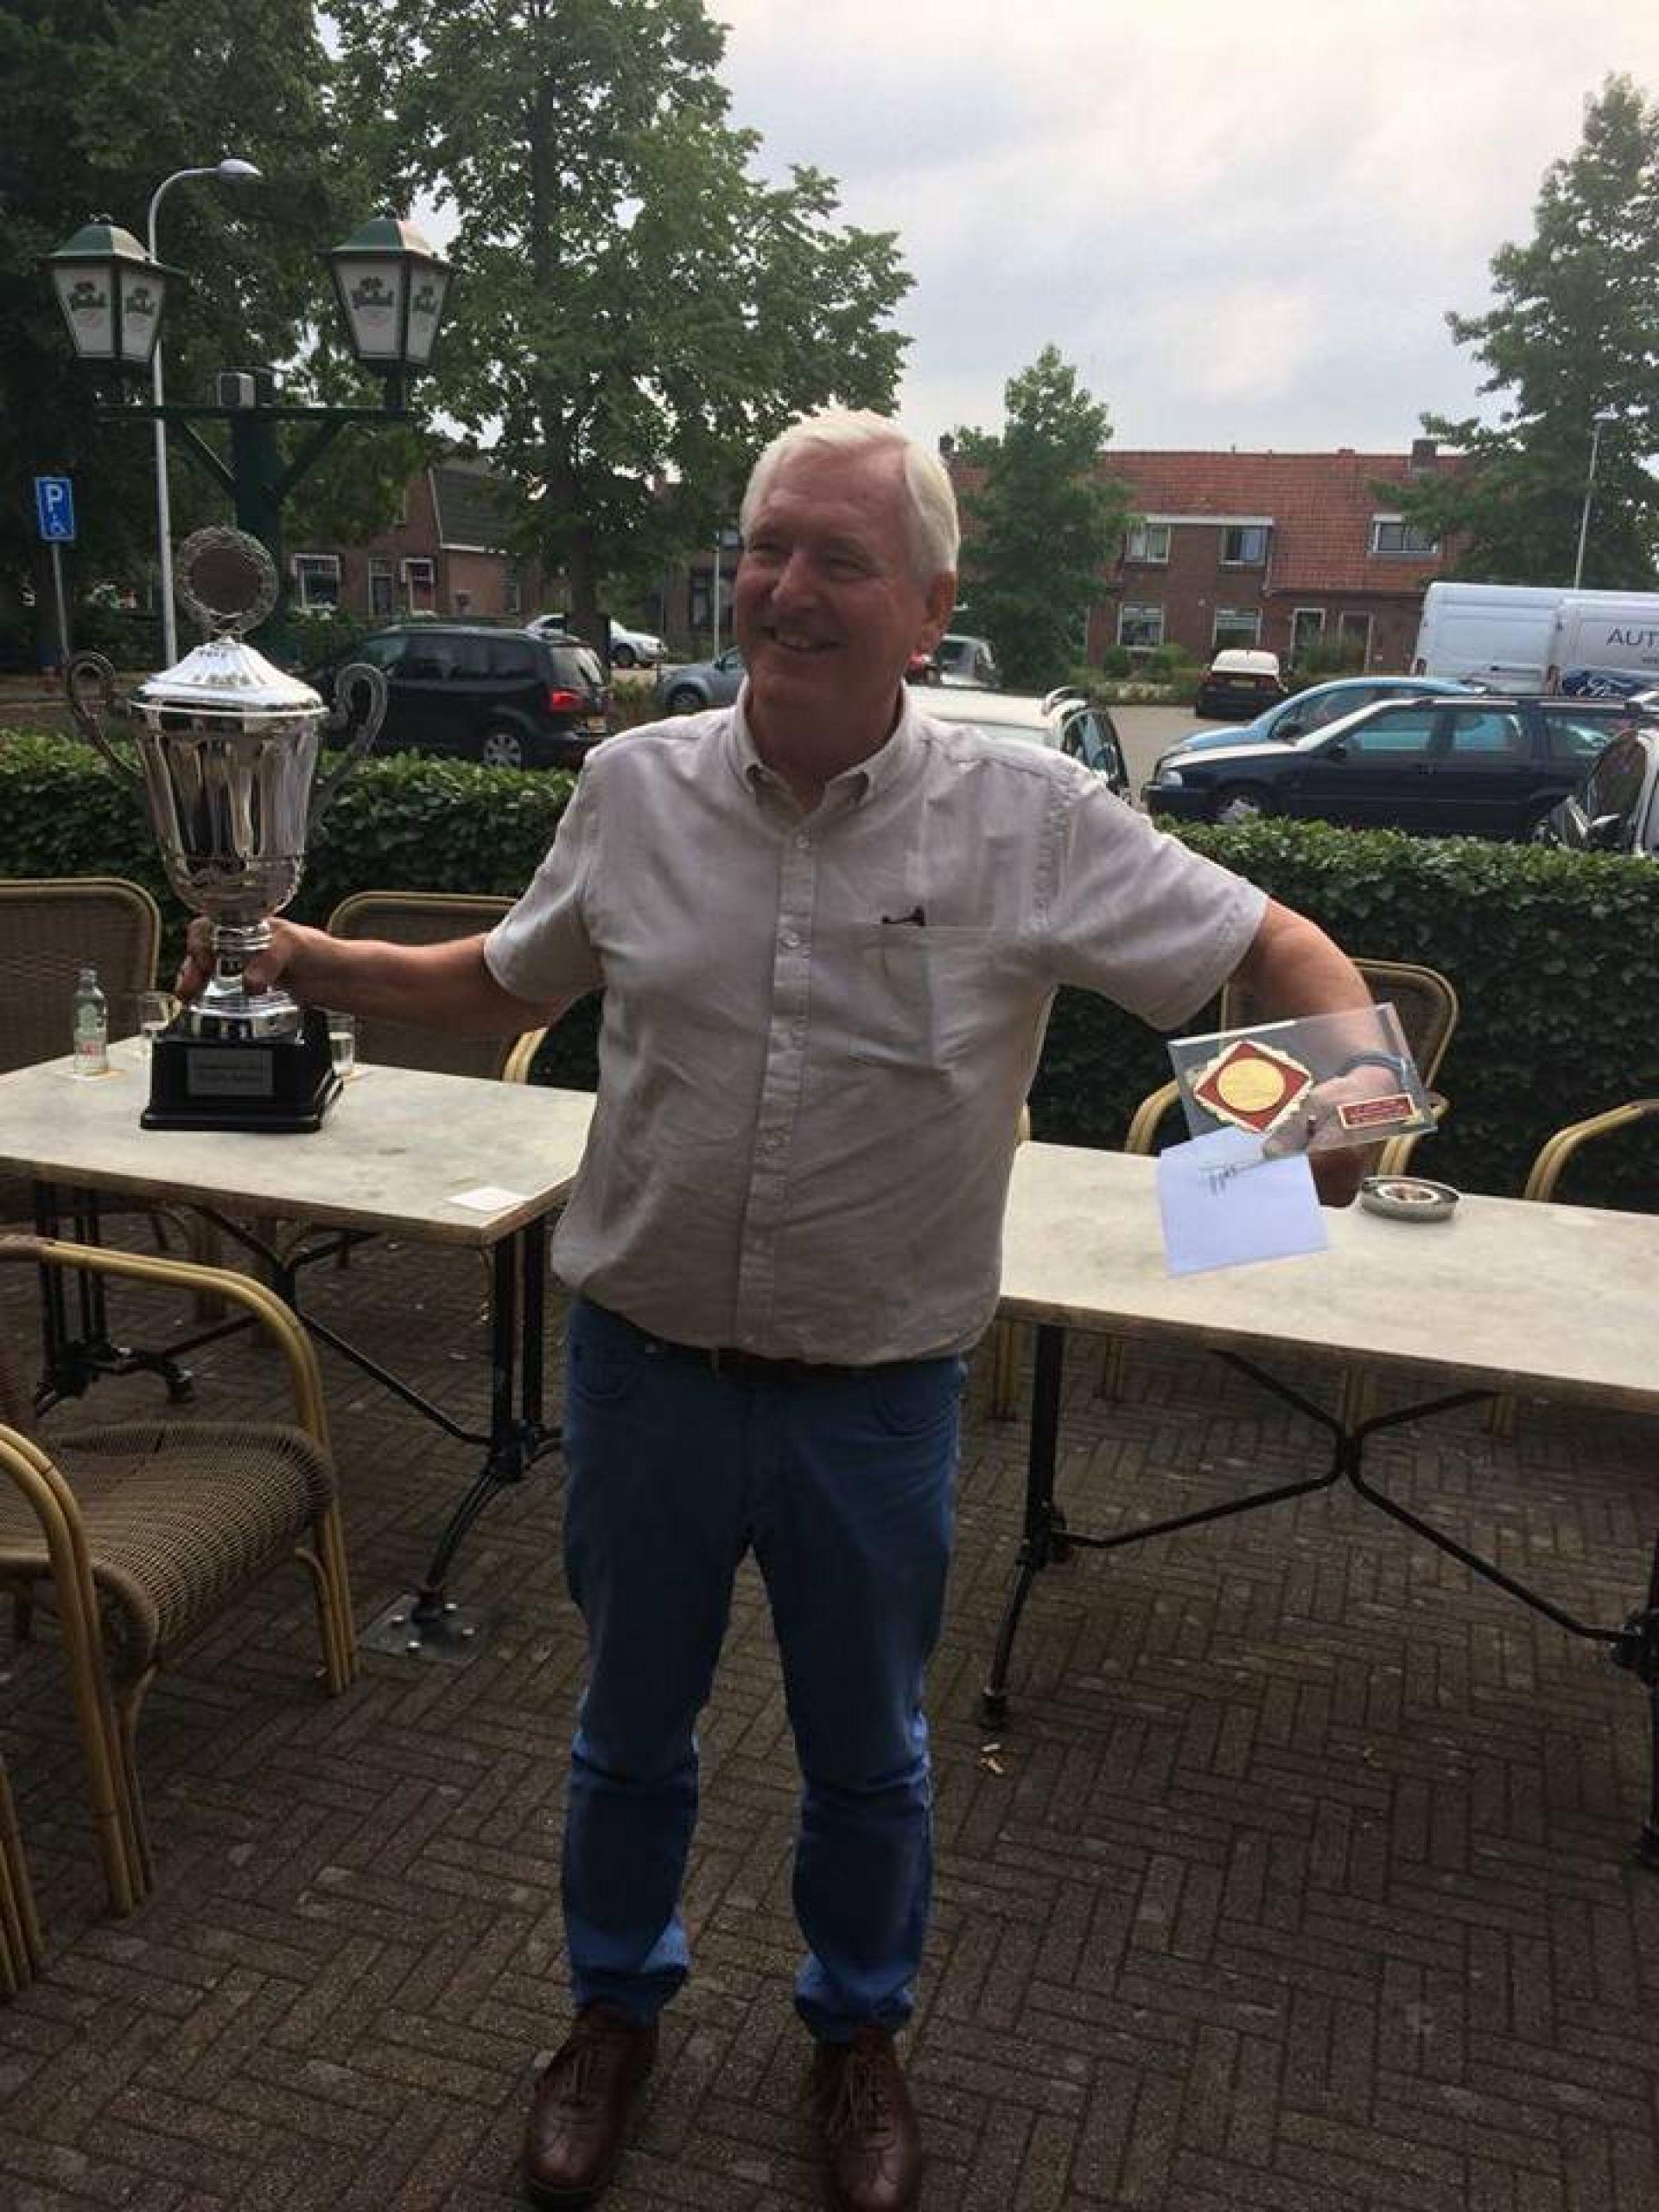 Willem Dijkstra en Paul Holtkamp winnen Delden Open biljarttoernooi